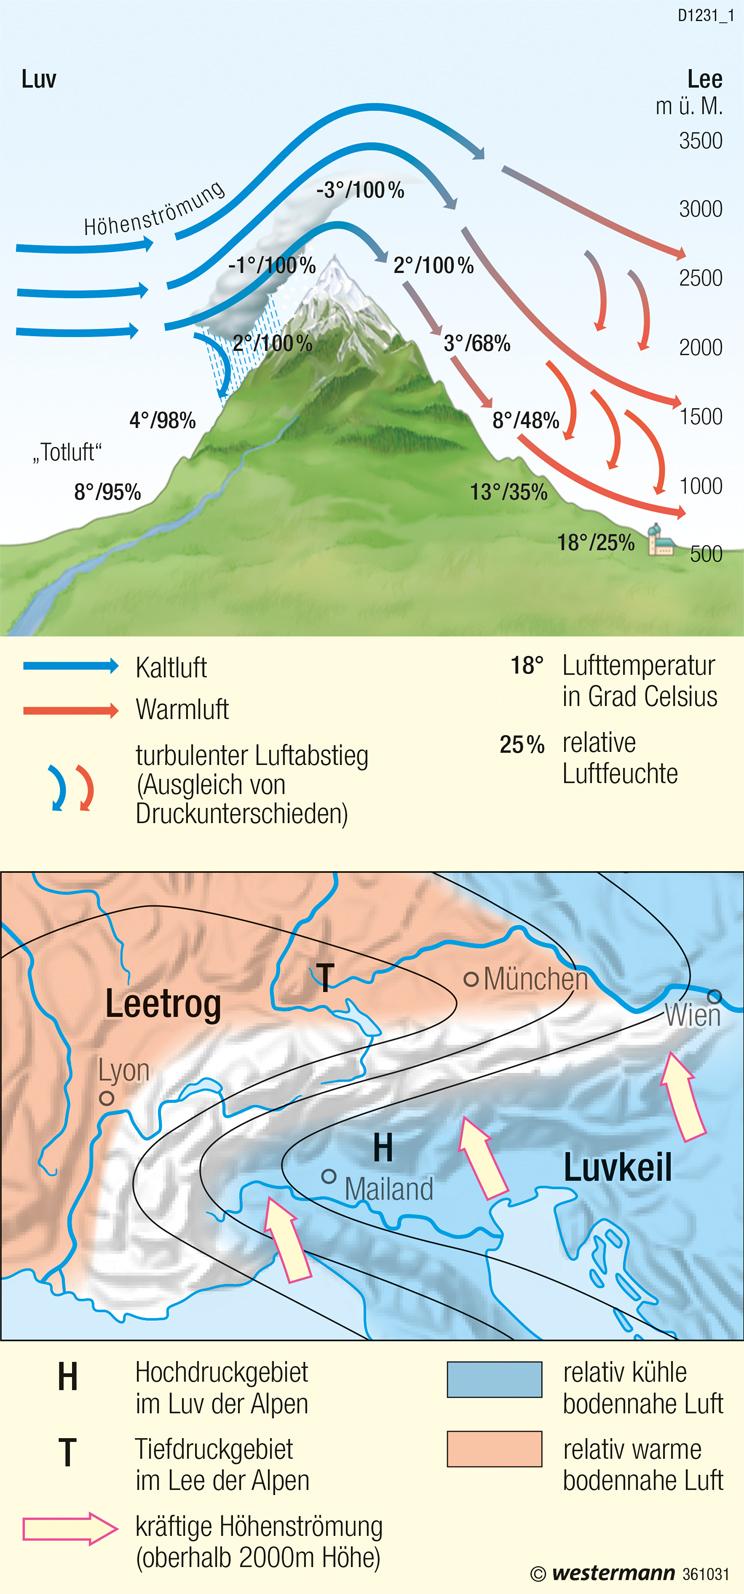   Föhnwind (regionales Windsystem)   Europa - Klima   Karte 95/4